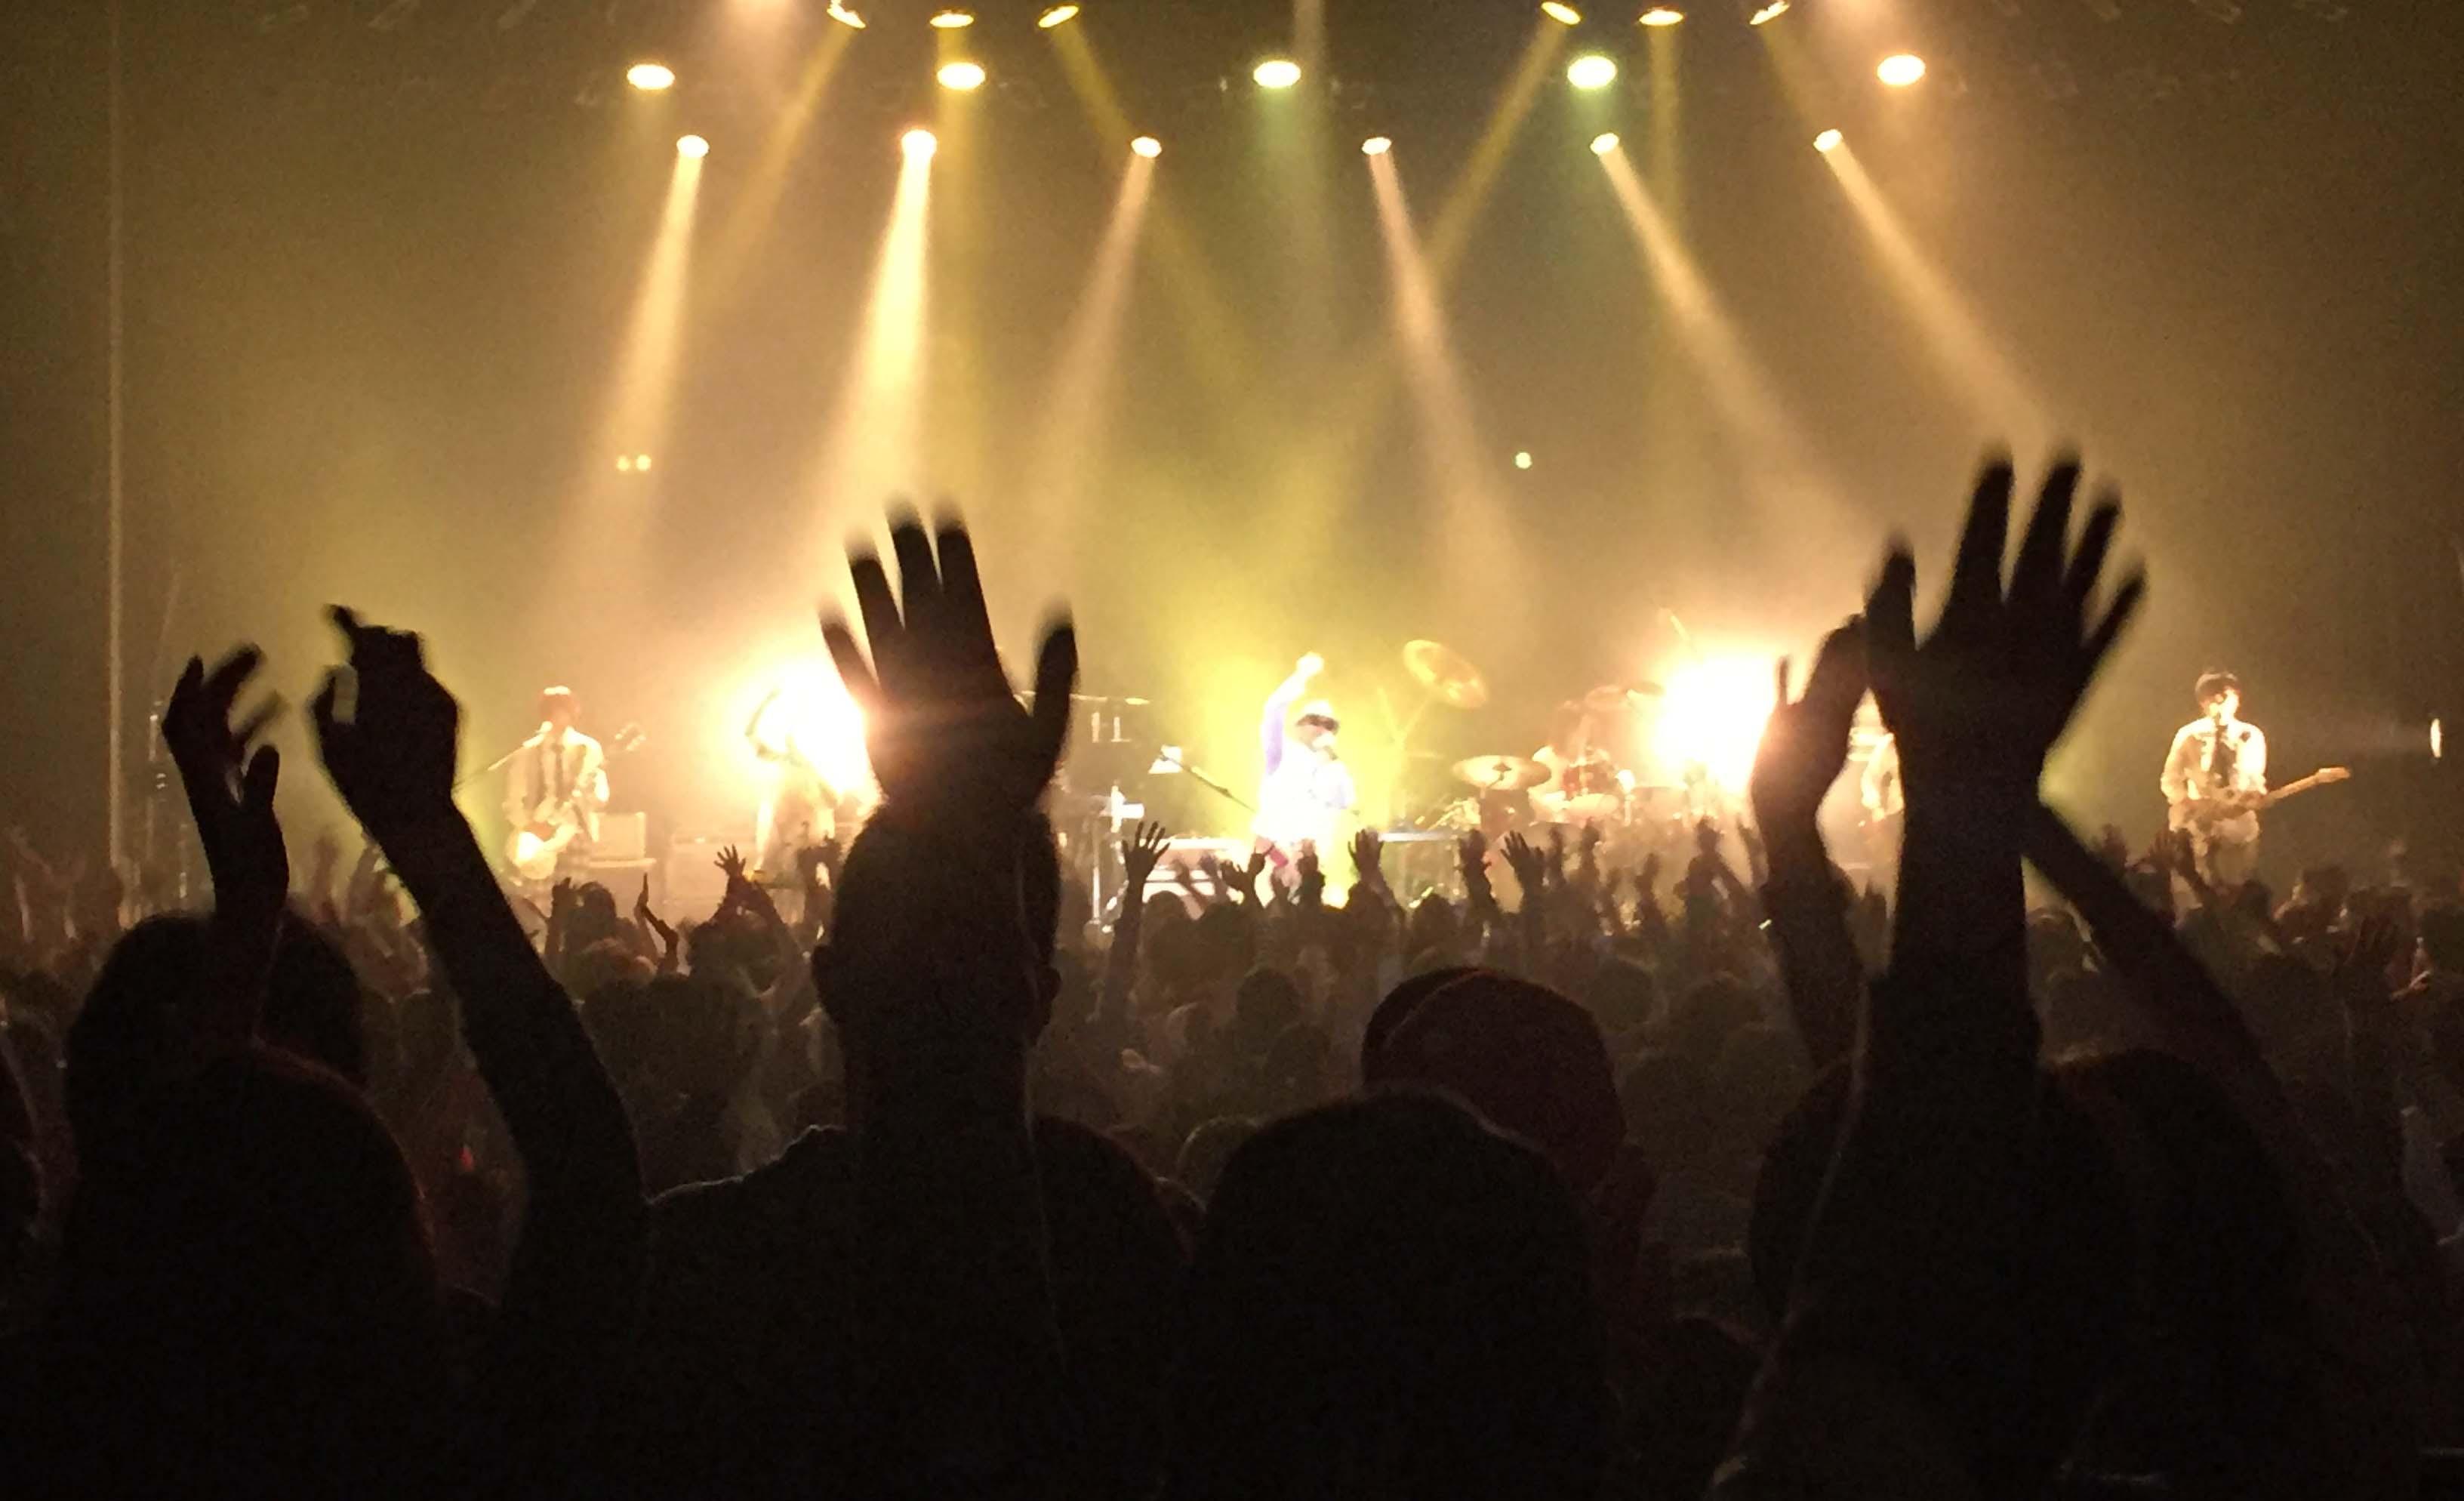 『Chage Live Tour 2015 〜天使がくれたハンマー〜』広島・大阪・福岡公演終了!